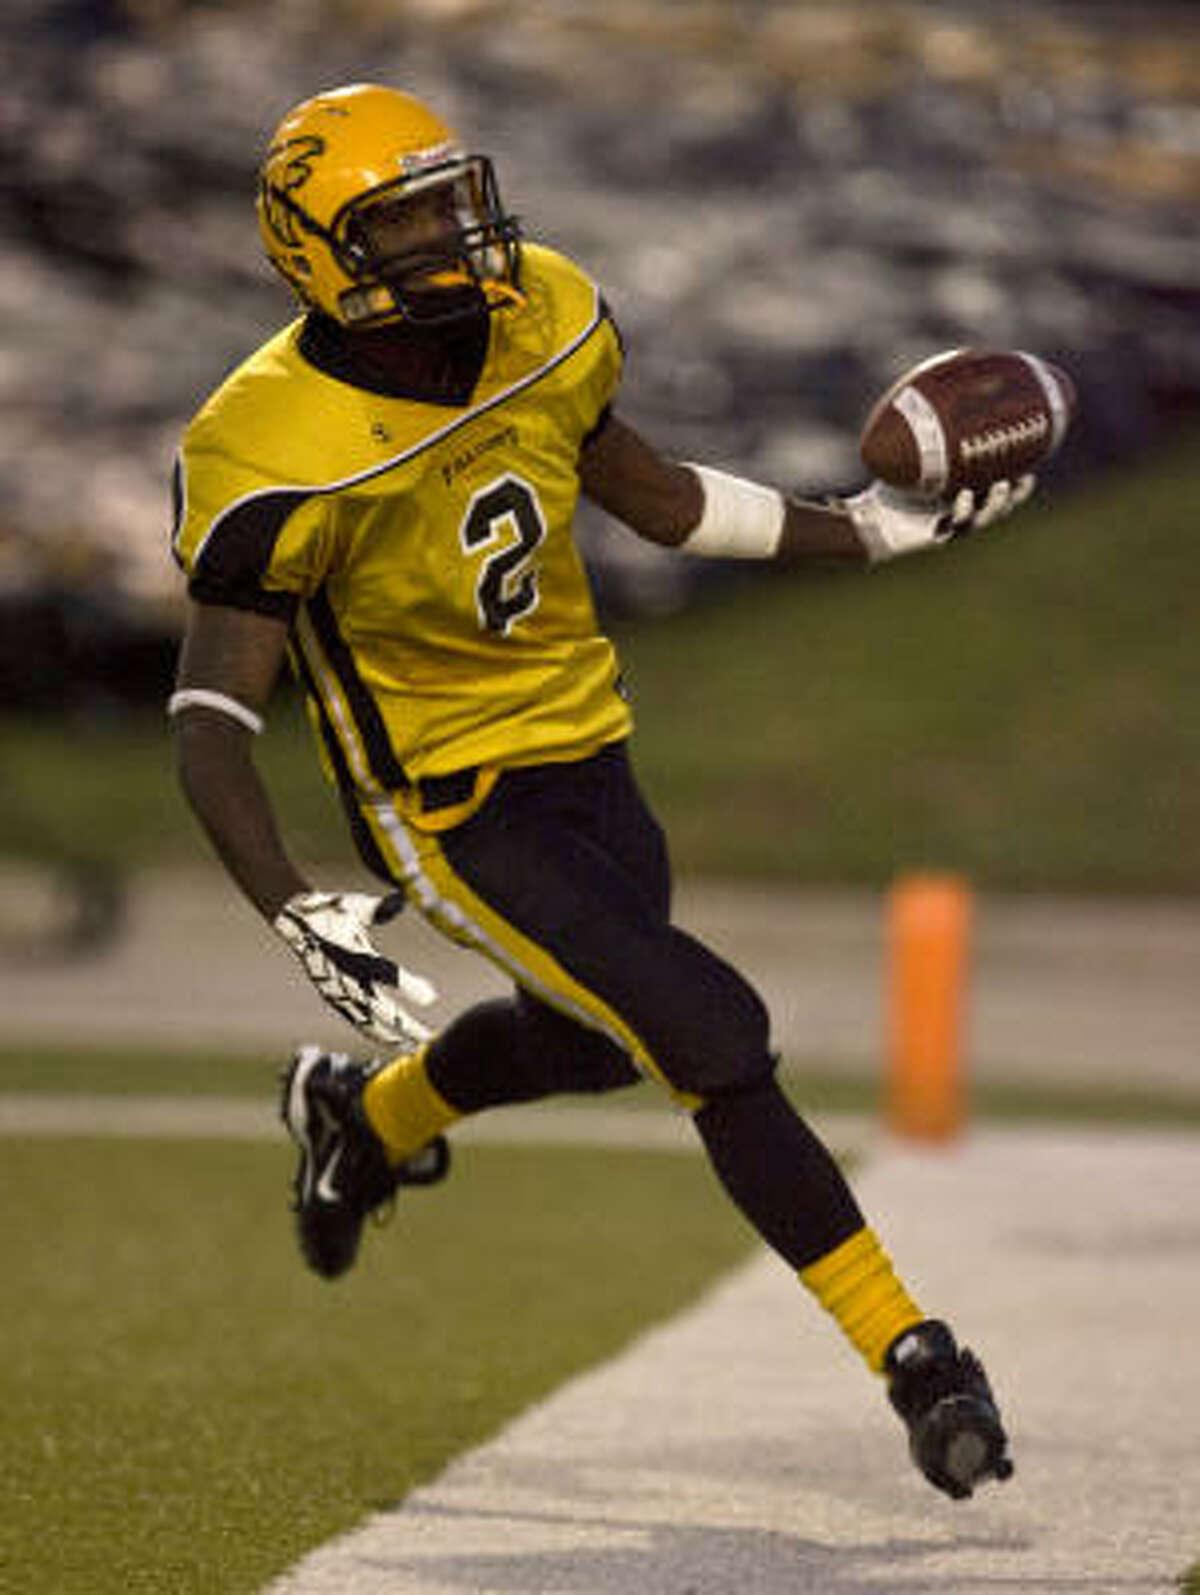 Jones 41, Wheatley 22 Jones' Michael Holmes celebrates after scoring a first-half touchdown against Wheatley during Saturday's District 22-4A battle at Delmar Stadium.